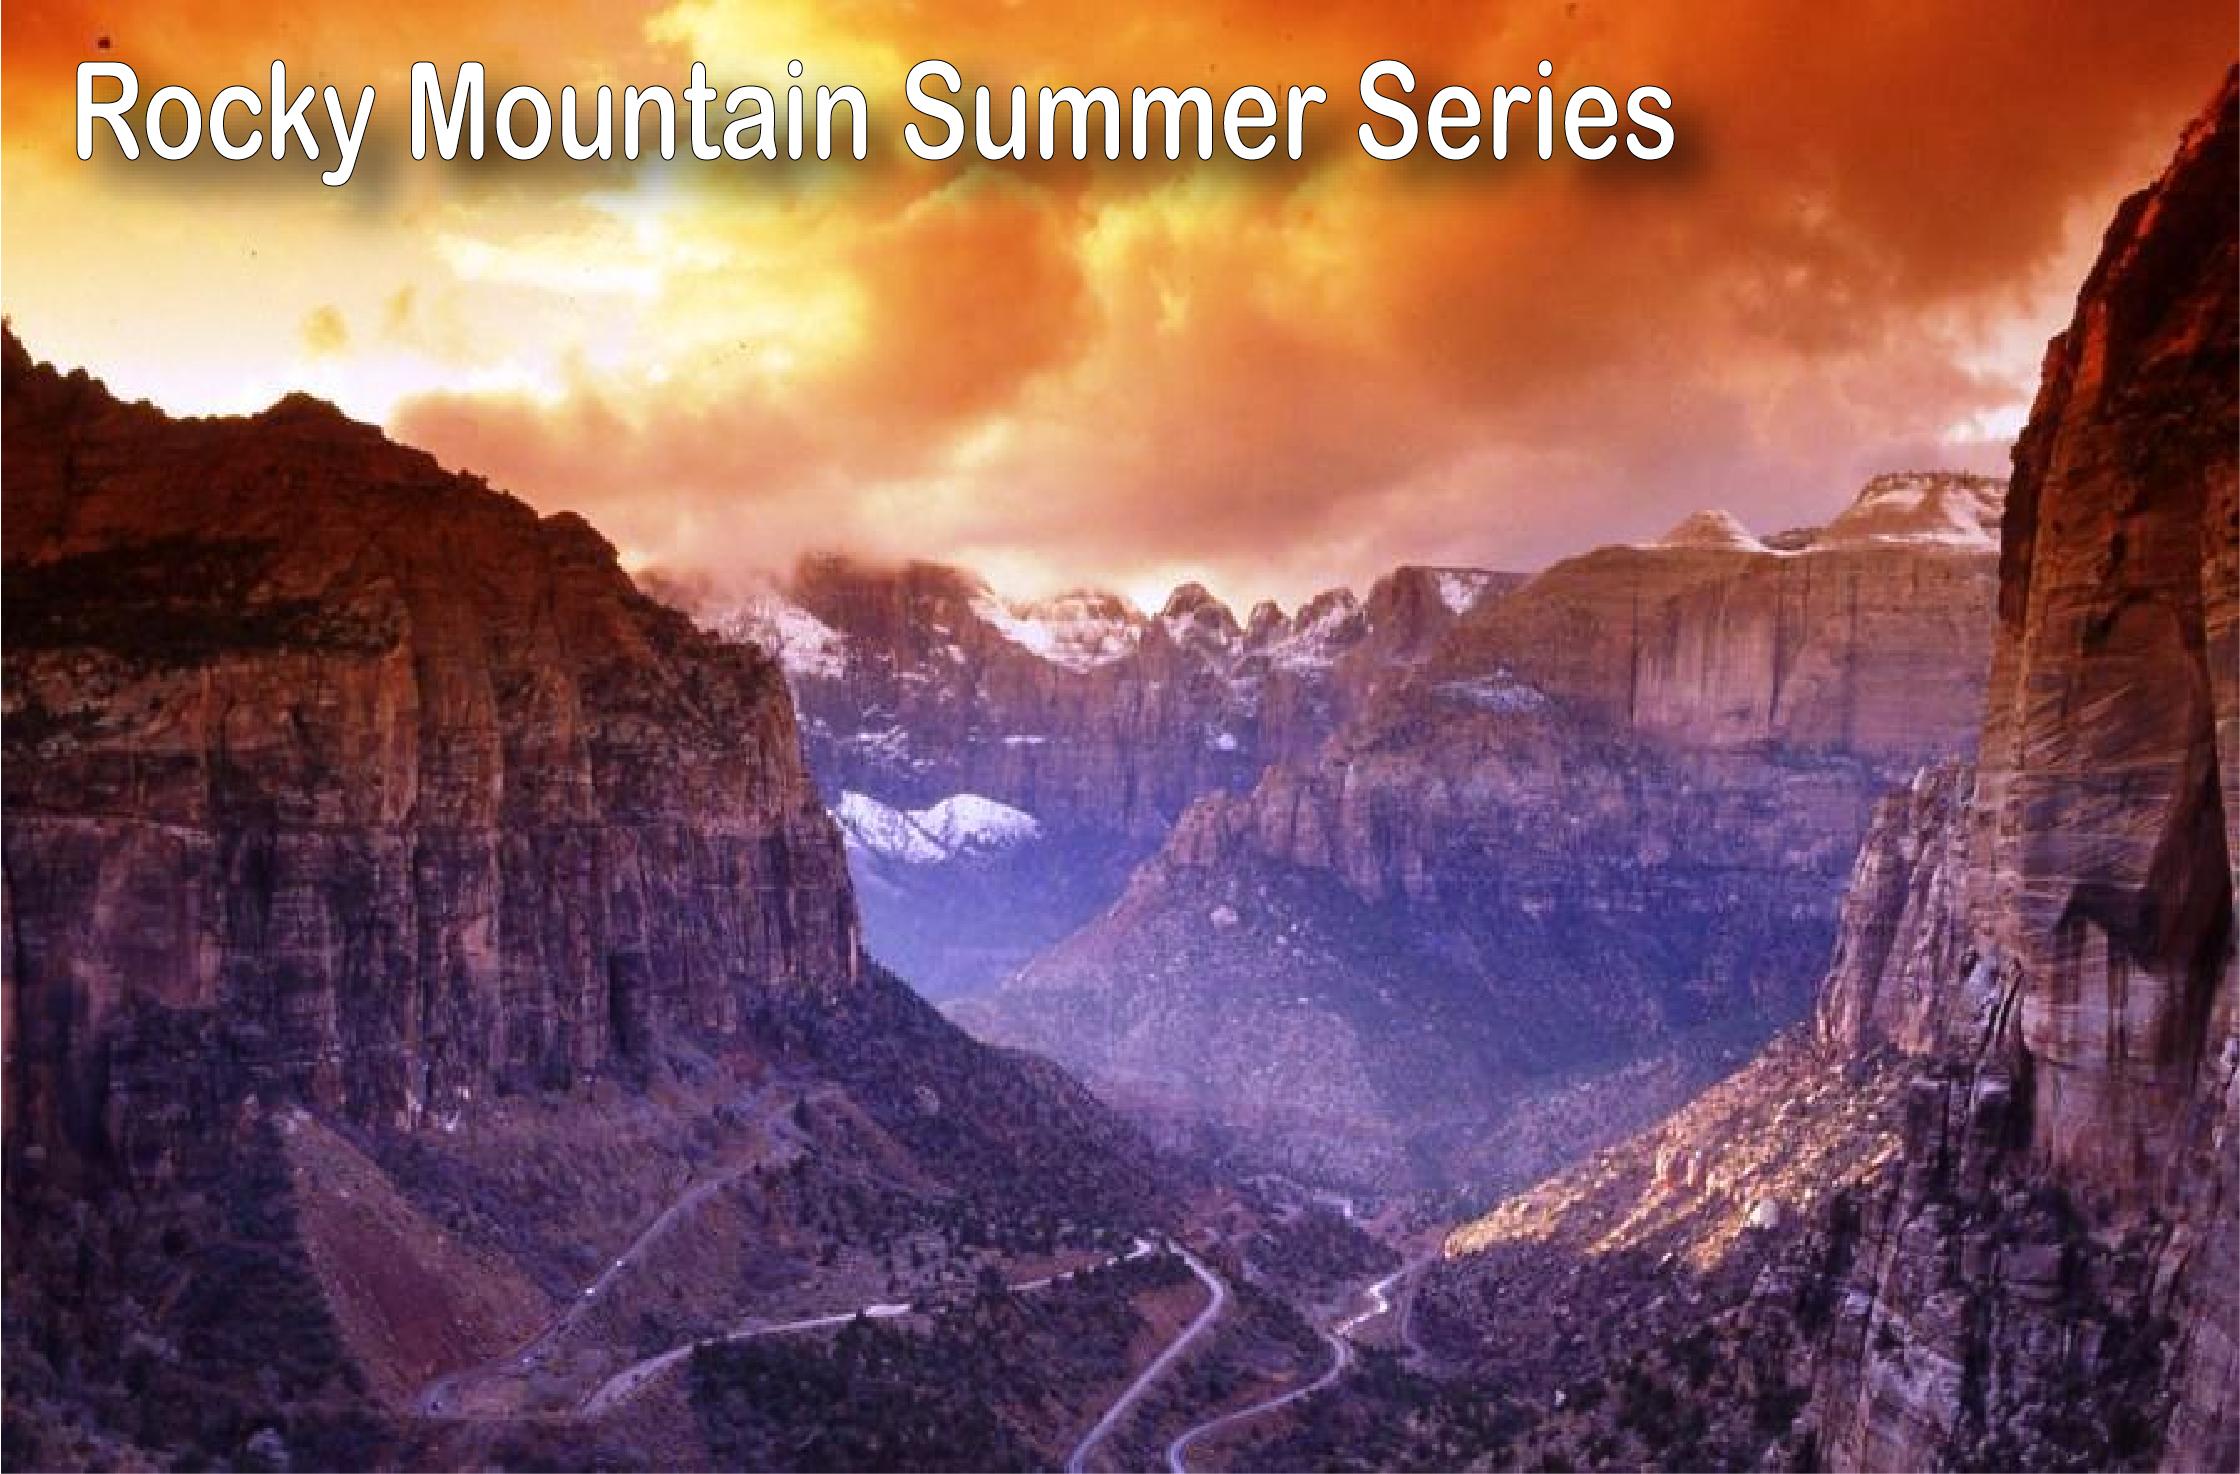 Rocky Mountain Summer Series